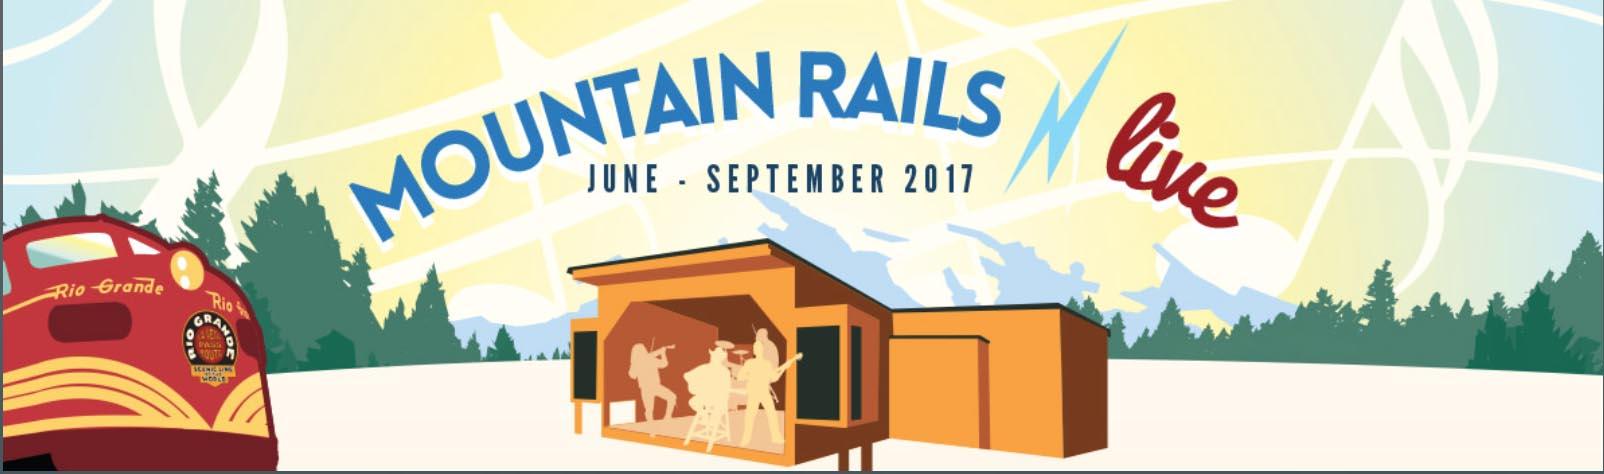 Mountain rails banner